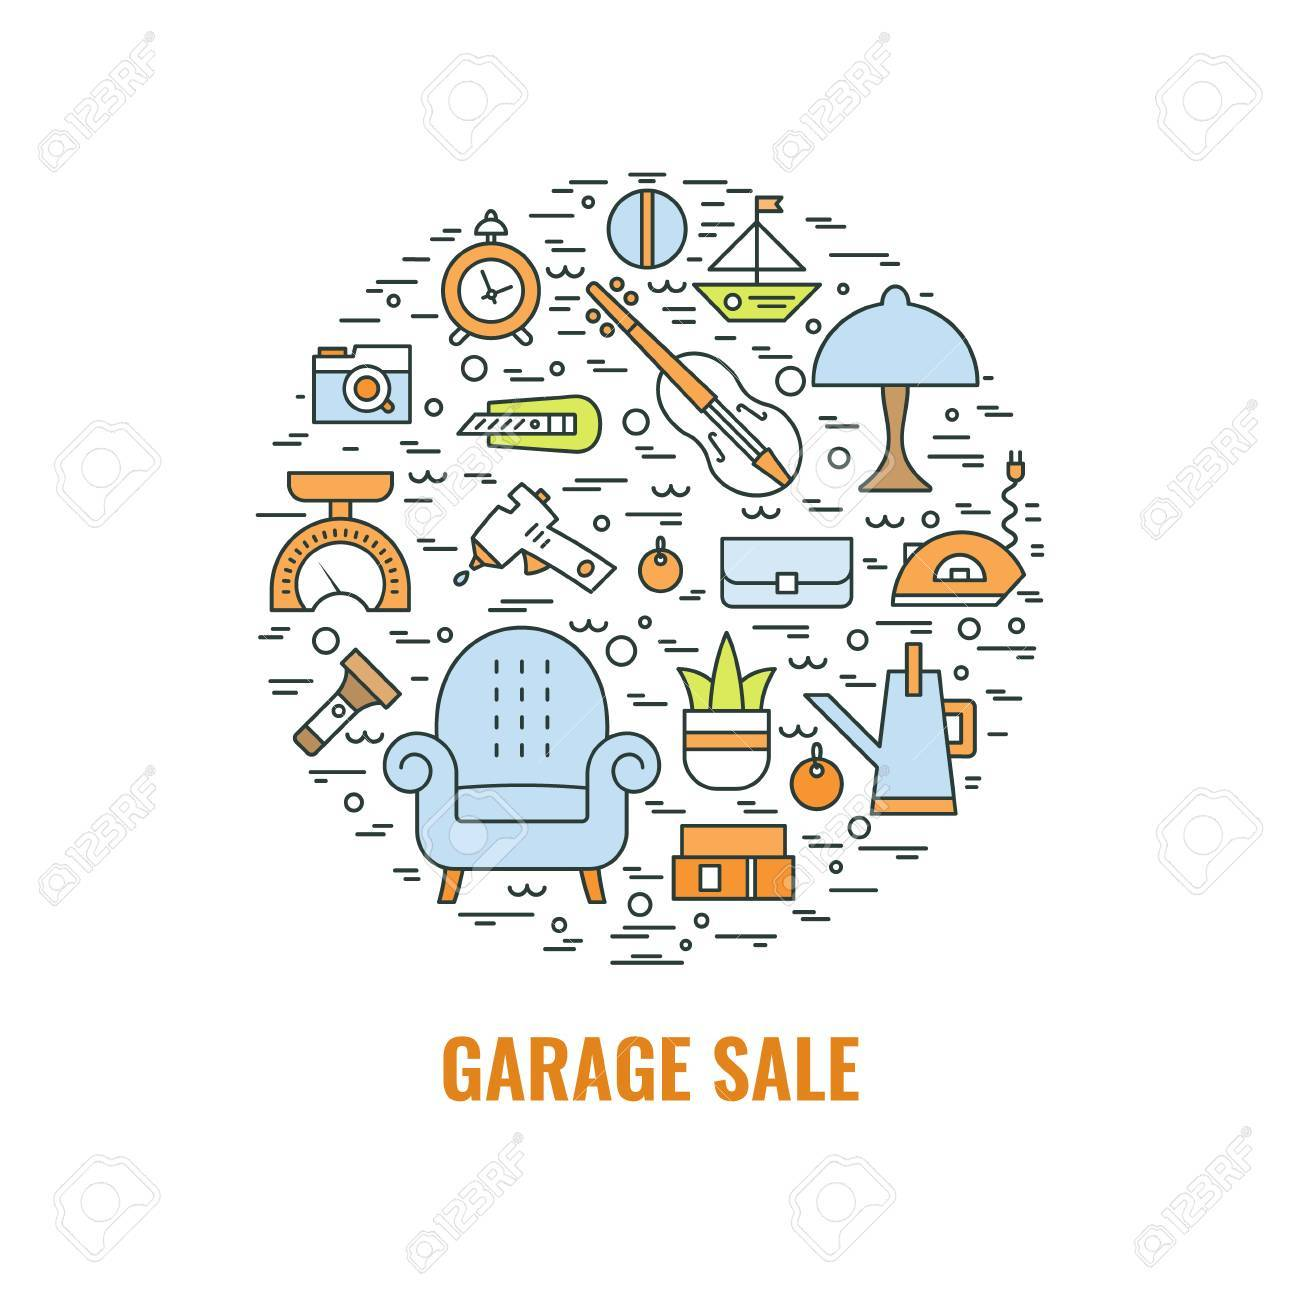 Garage sale sign. Template for poster, banner, flyer.Yard sale flyer template. Vector line style illustration. - 85986118